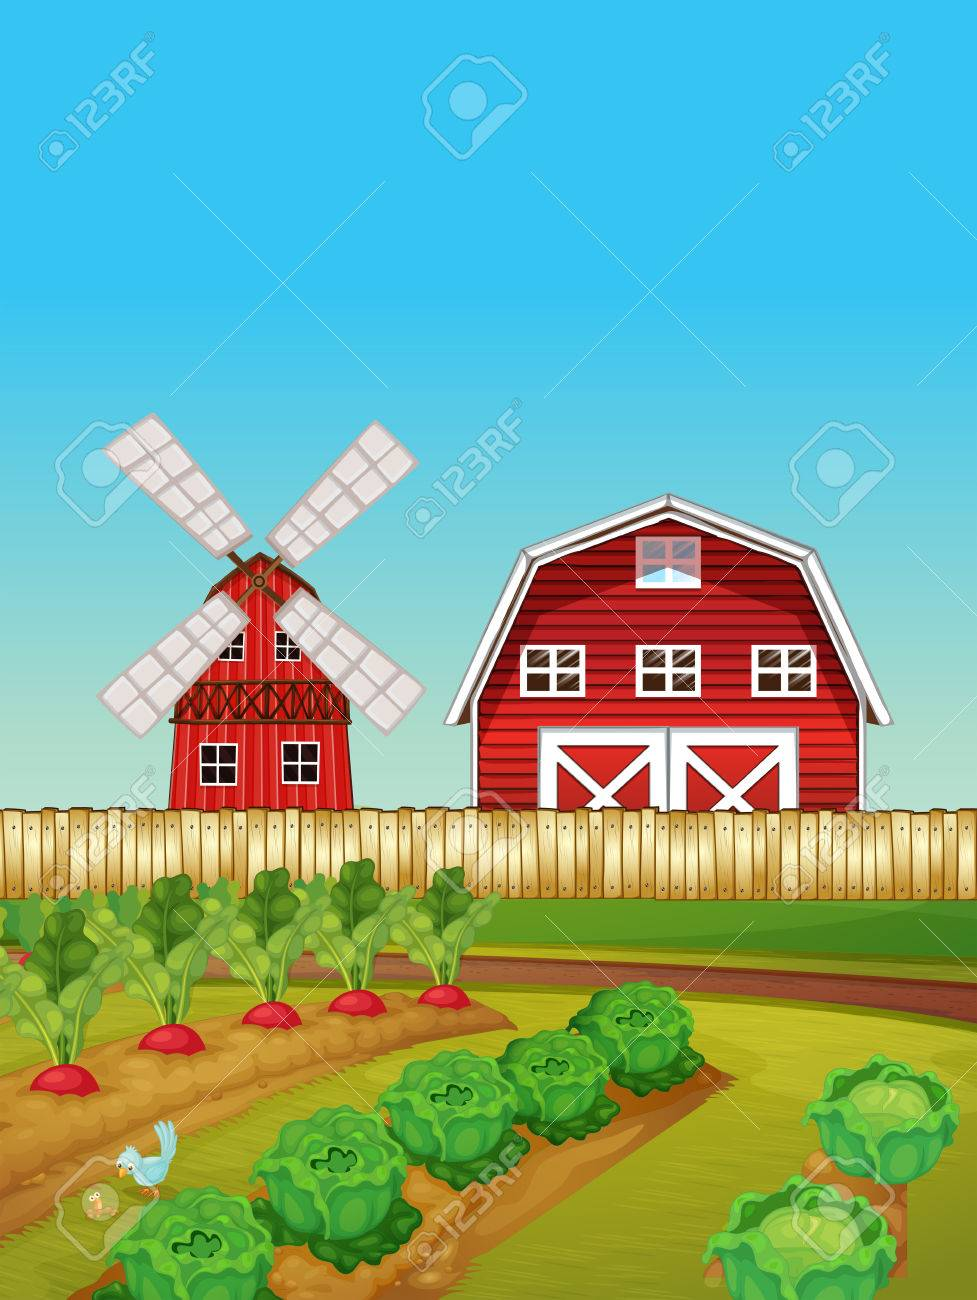 Farm Scene With Vegetable Garden And Barn Illustration Royalty Free ... for Farm Garden Clipart  55jwn